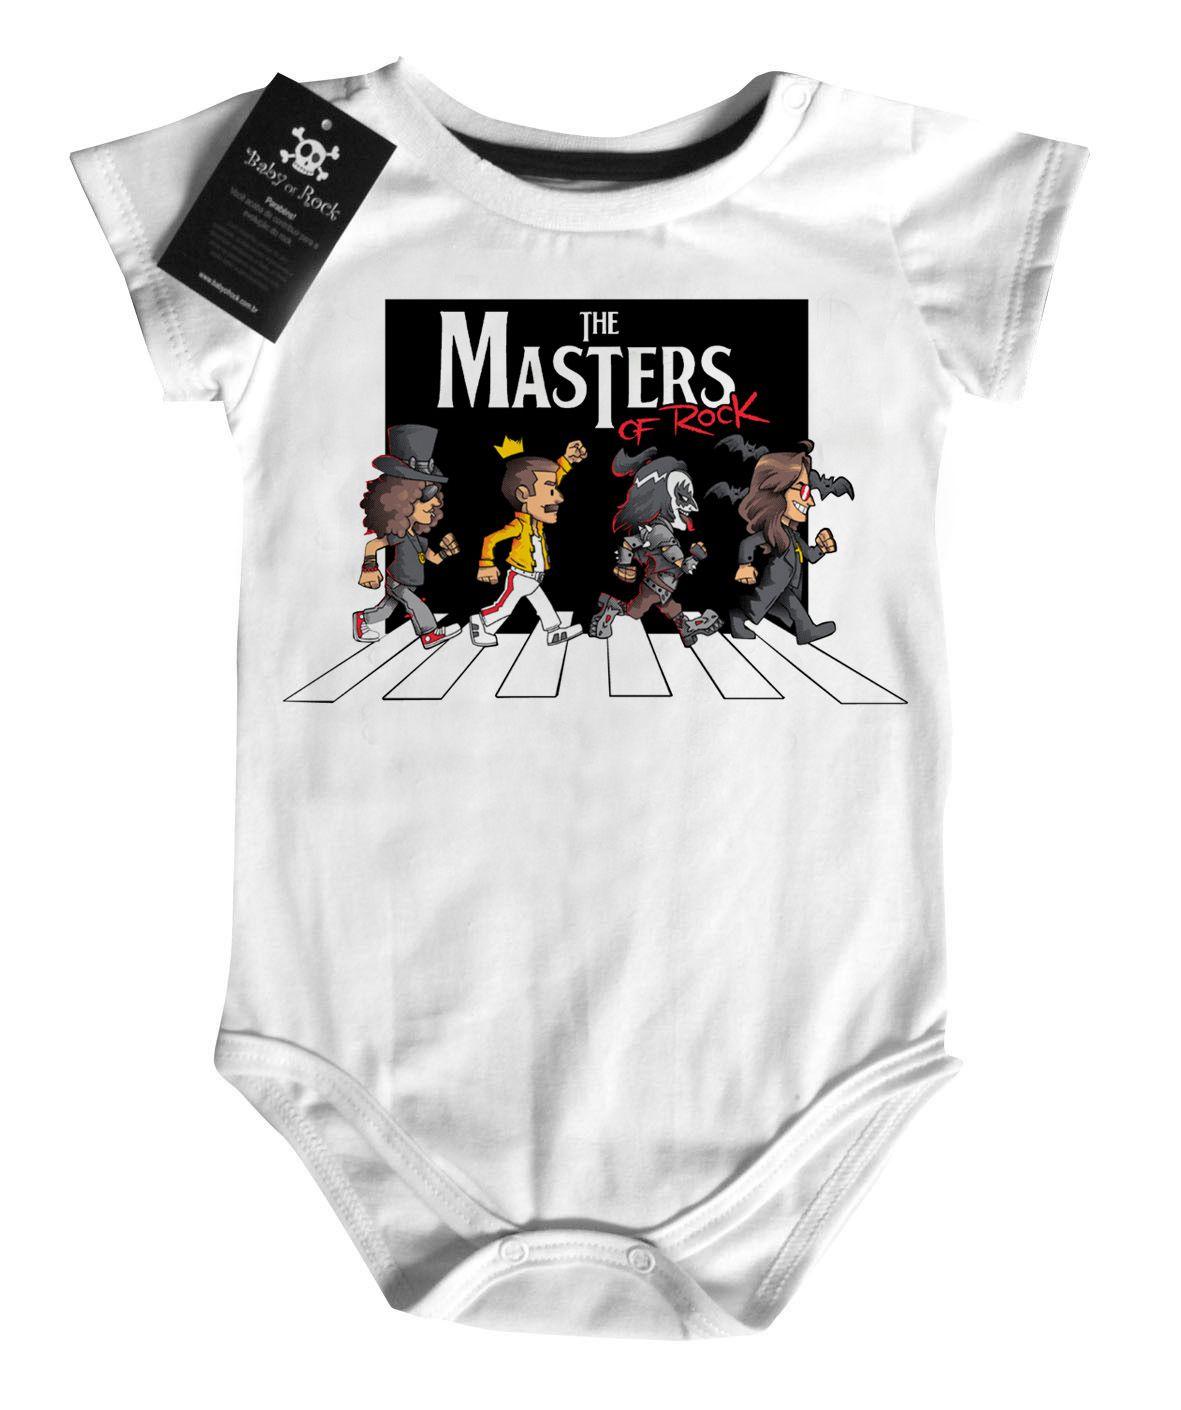 Body Bebe Rock ou Camiseta de  Rock The Masters of Rock   - Baby Monster S/A